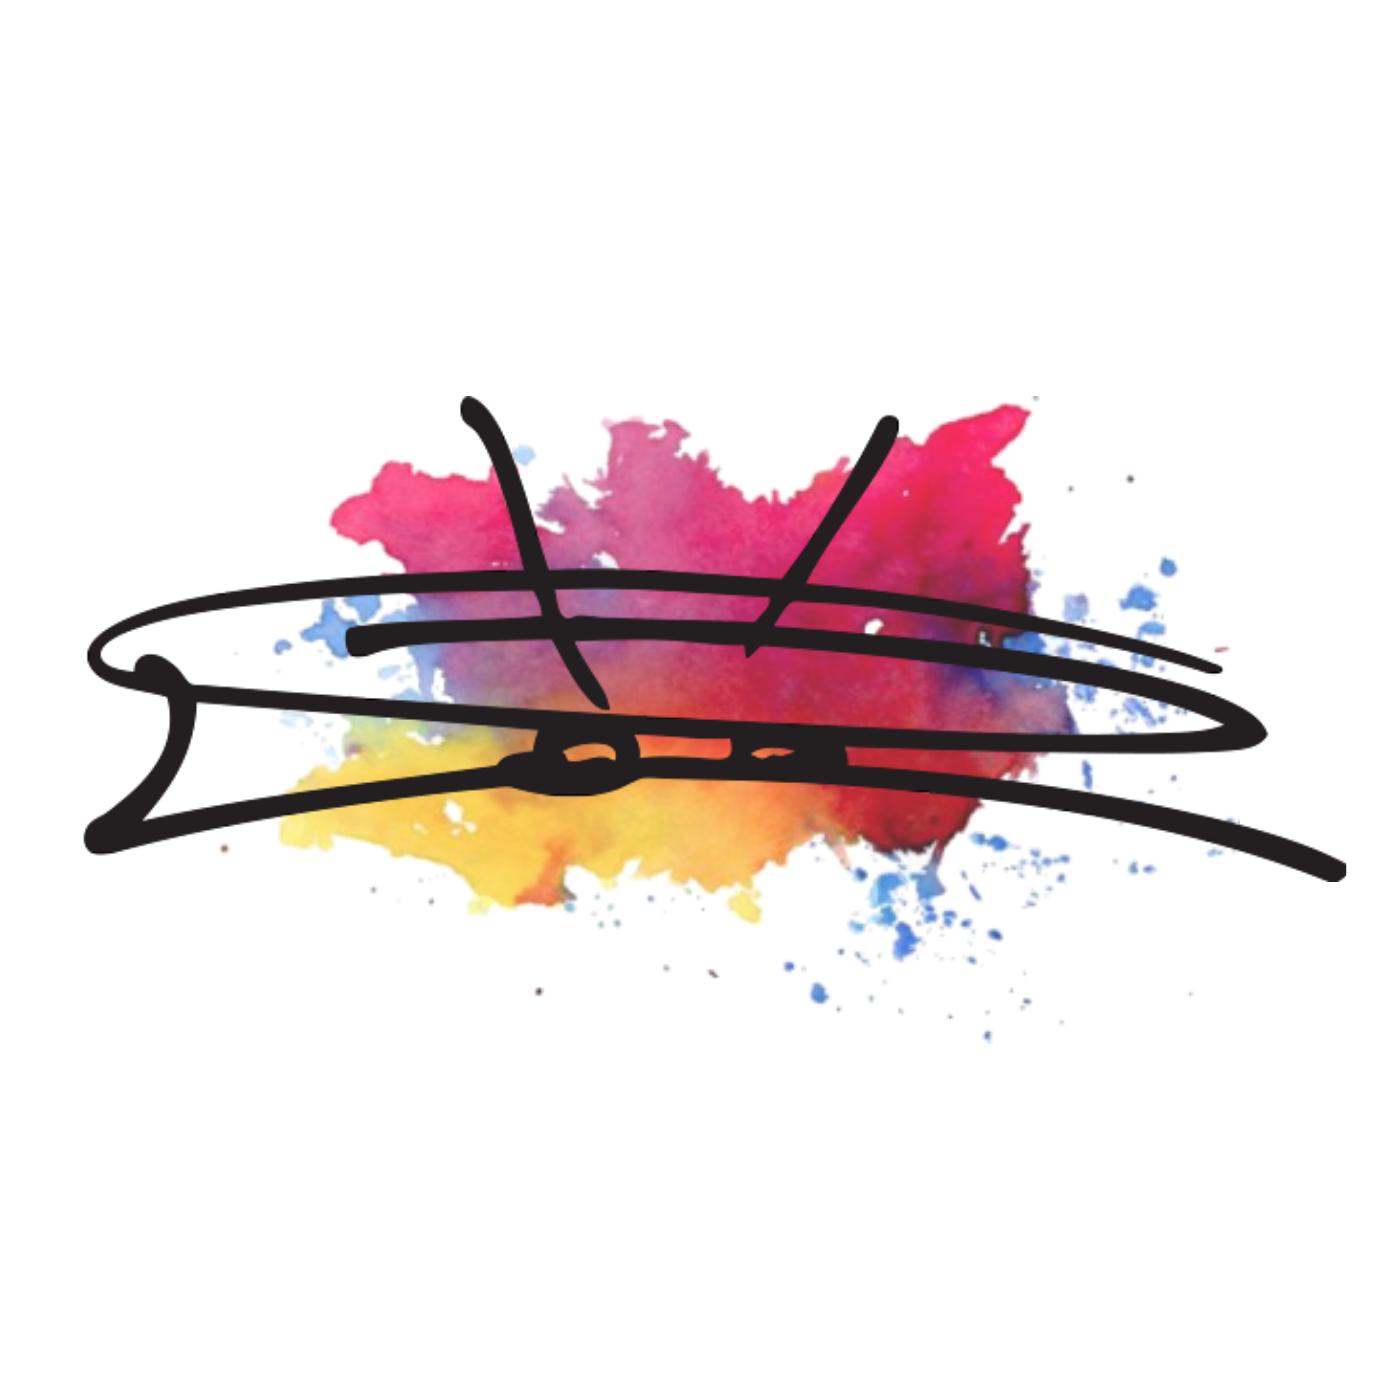 The mattdudleydrumming podcast show art